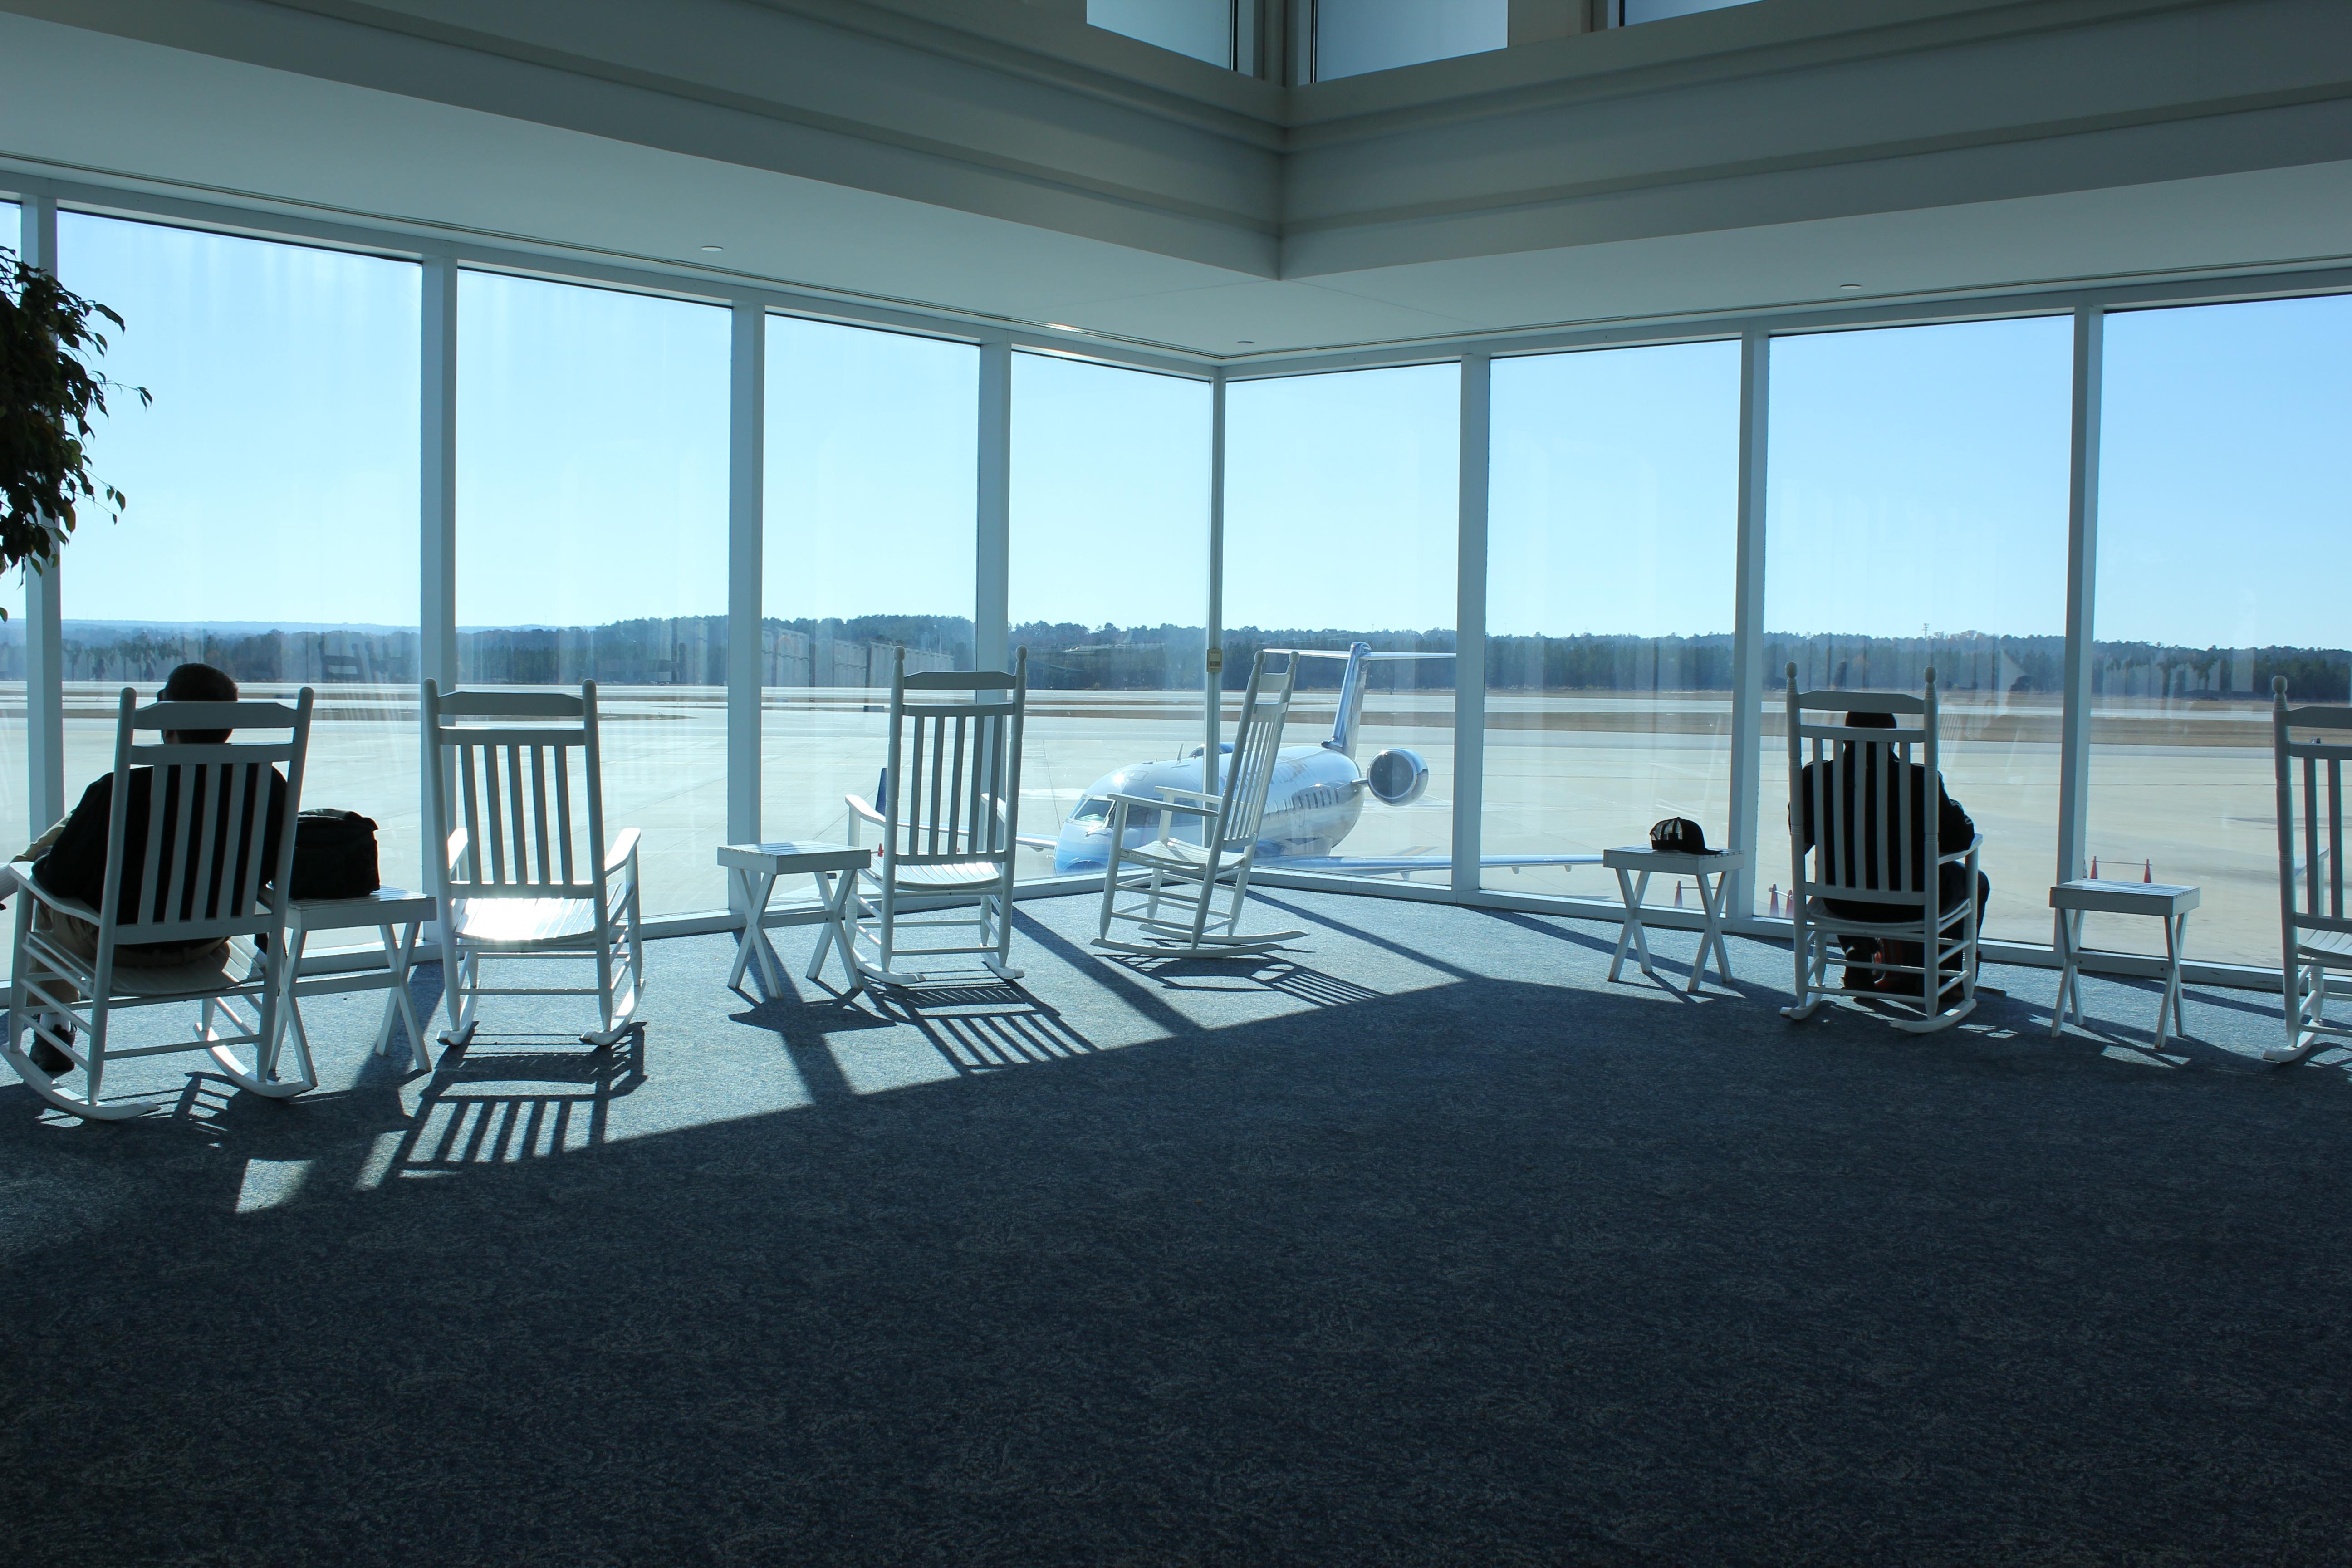 In home design columbia sc airport